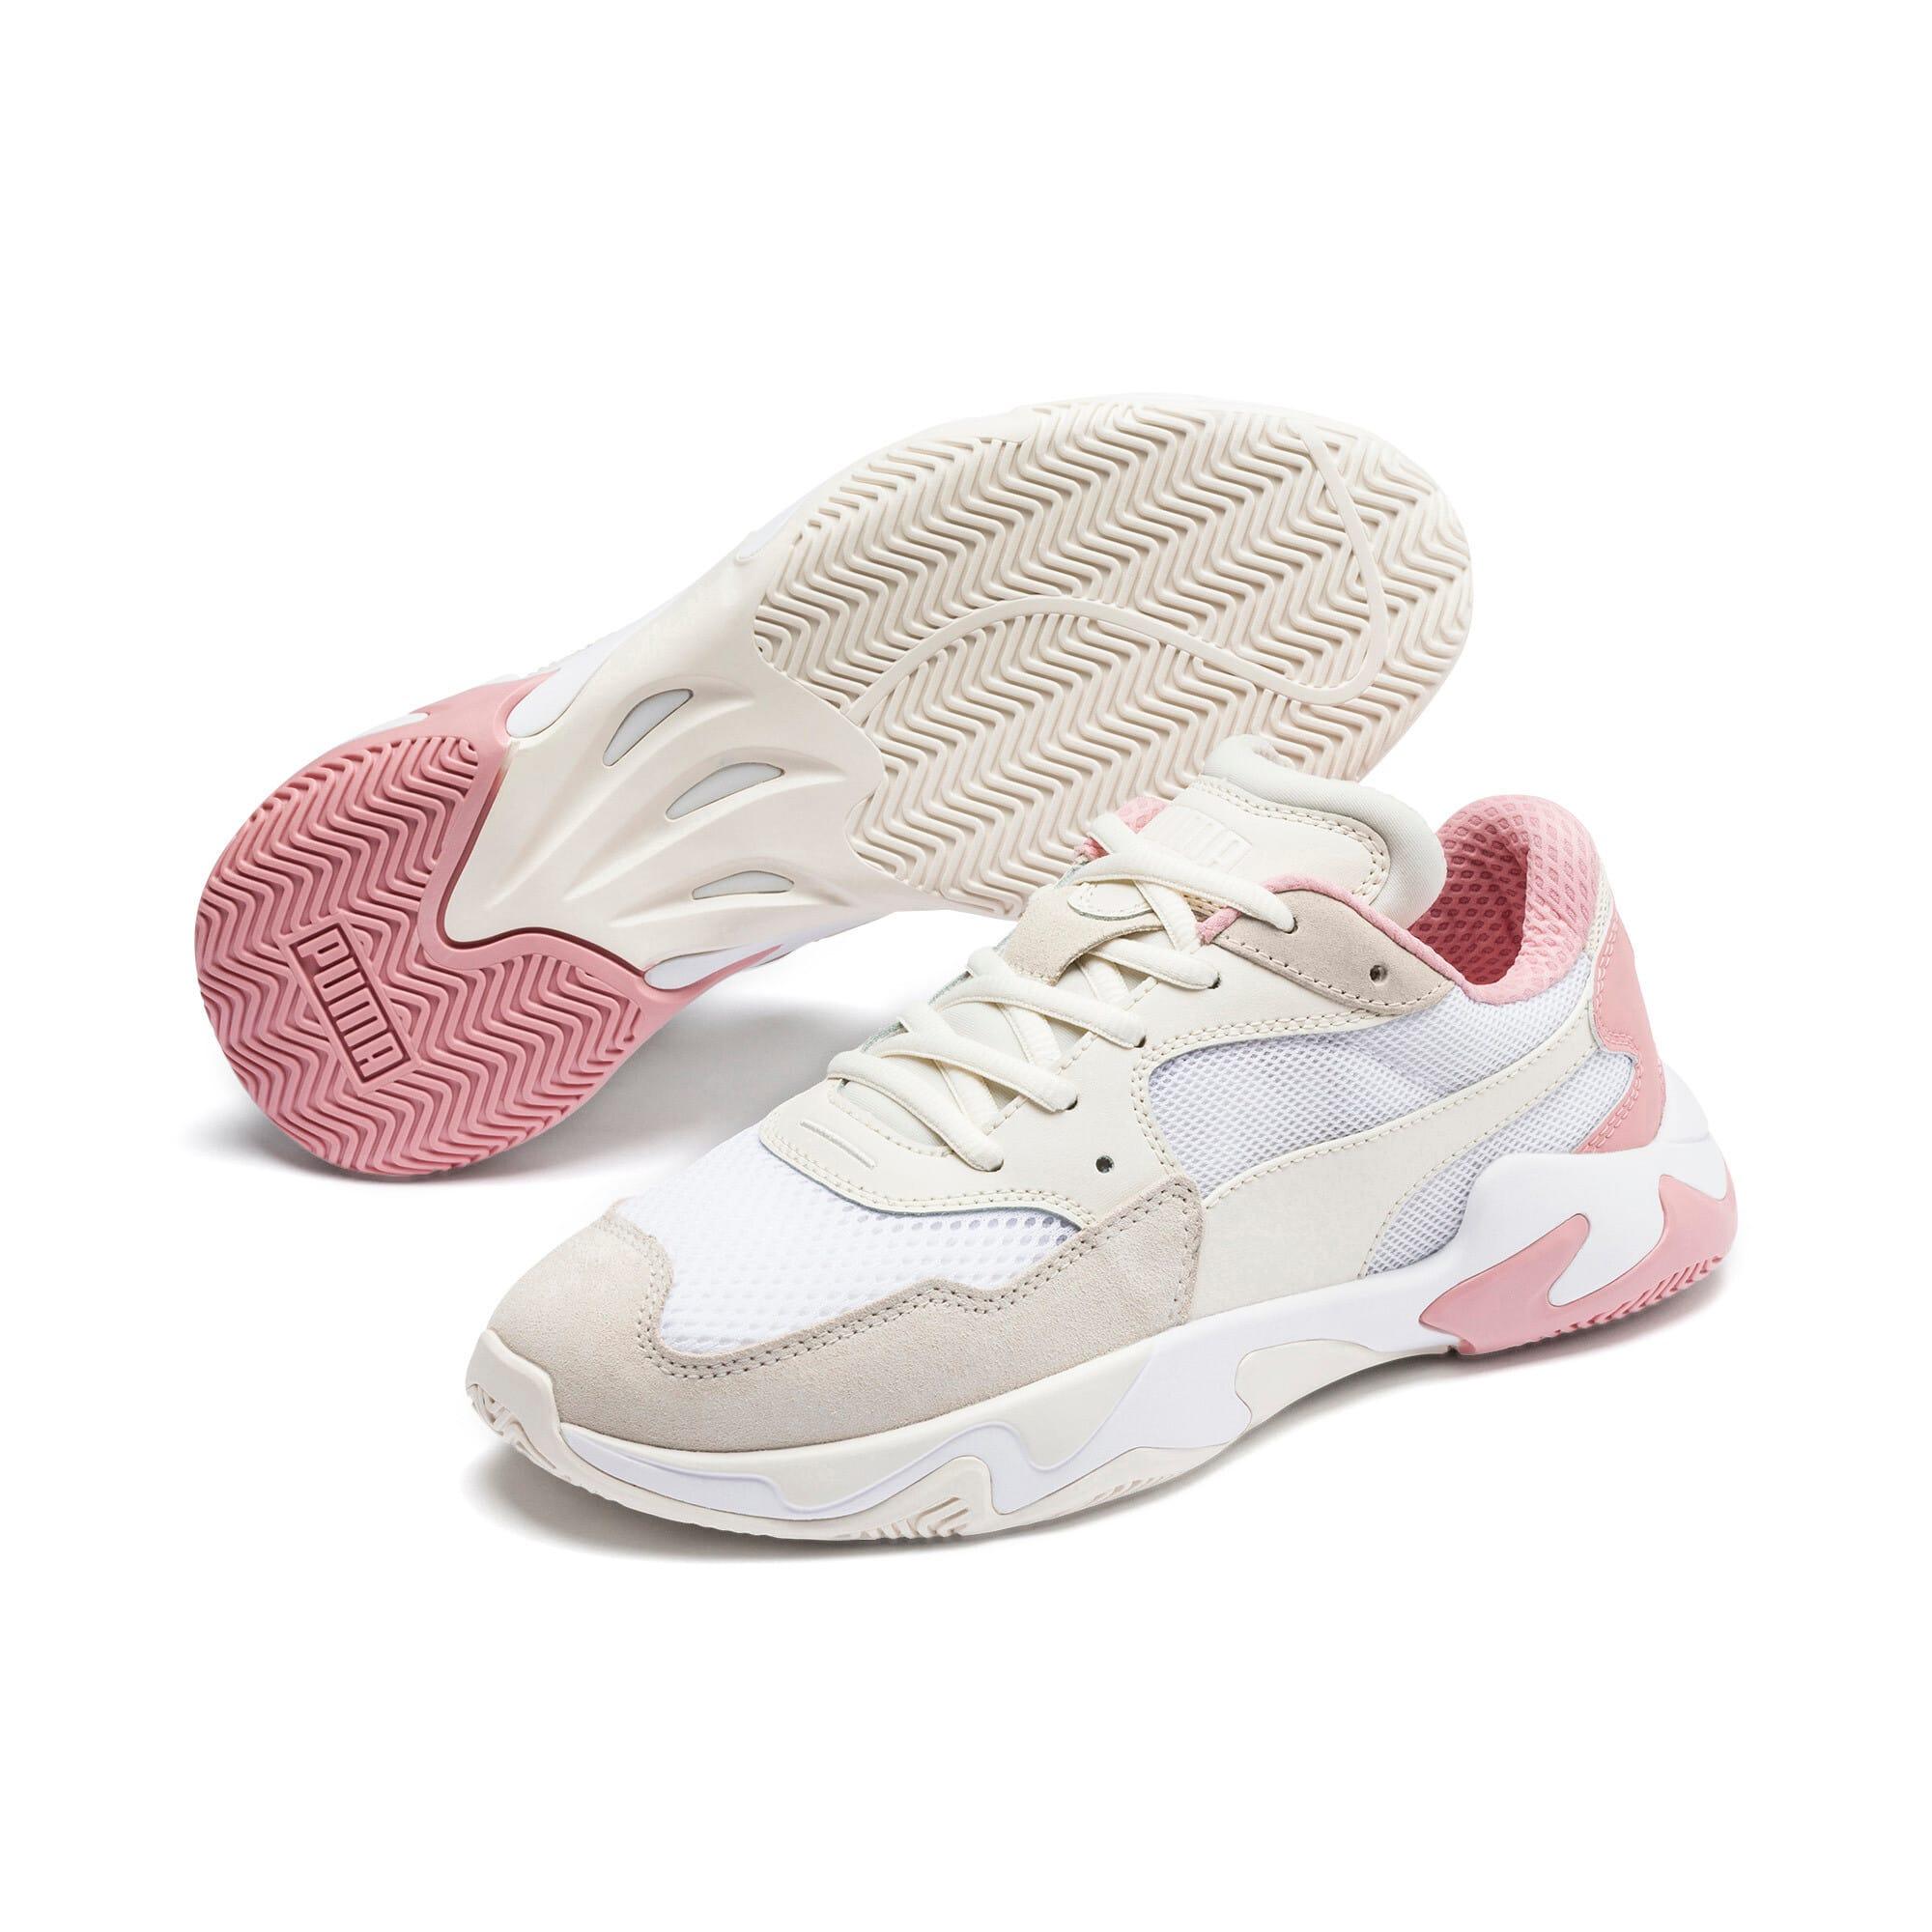 Thumbnail 3 of Storm Origin Sneakers, Pastel Parchment-Puma White, medium